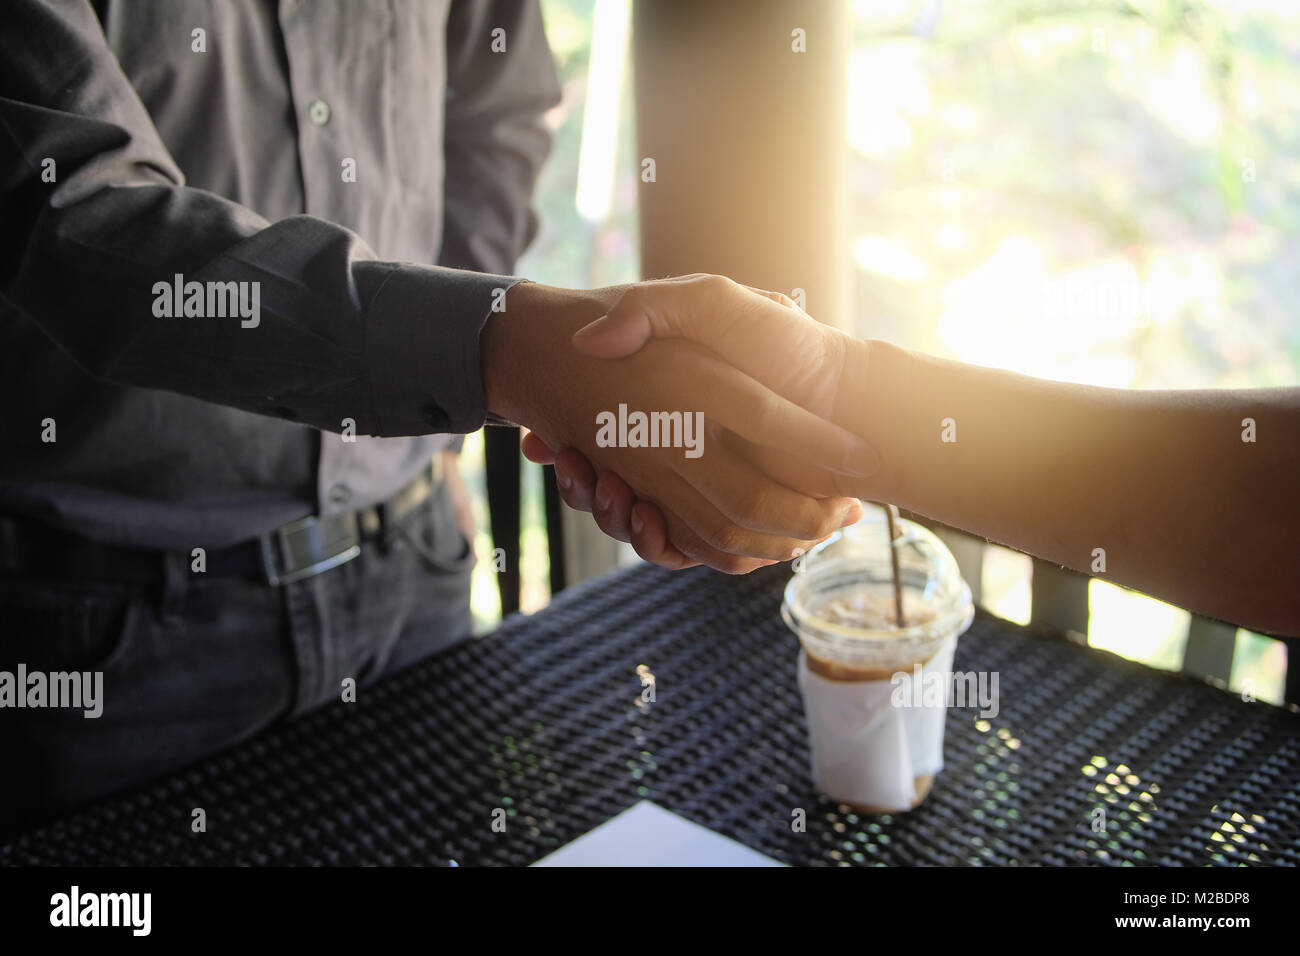 Image businessman handshake. Successful handshake after good deal. business meeting - Stock Image